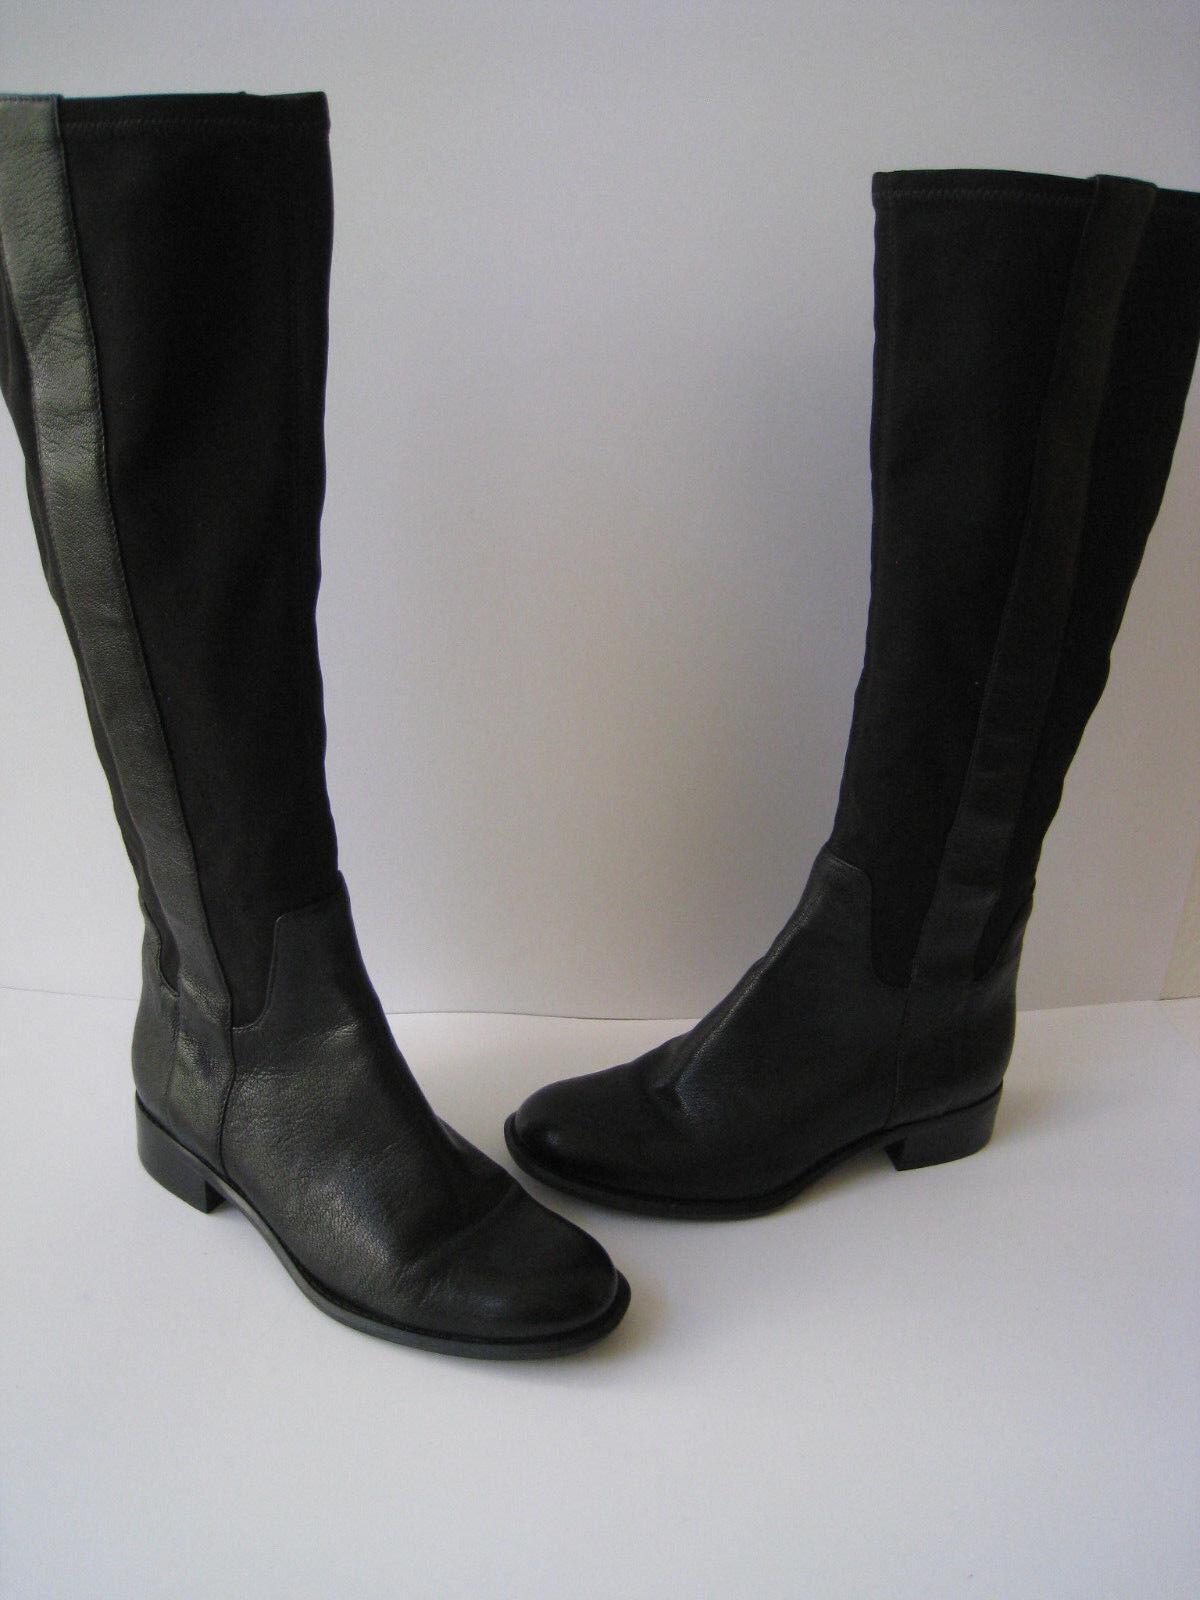 NINE WEST KNEE HI DRESS ELASTIC BLACK BLACK BLACK LEATHER Stiefel 1 1/4